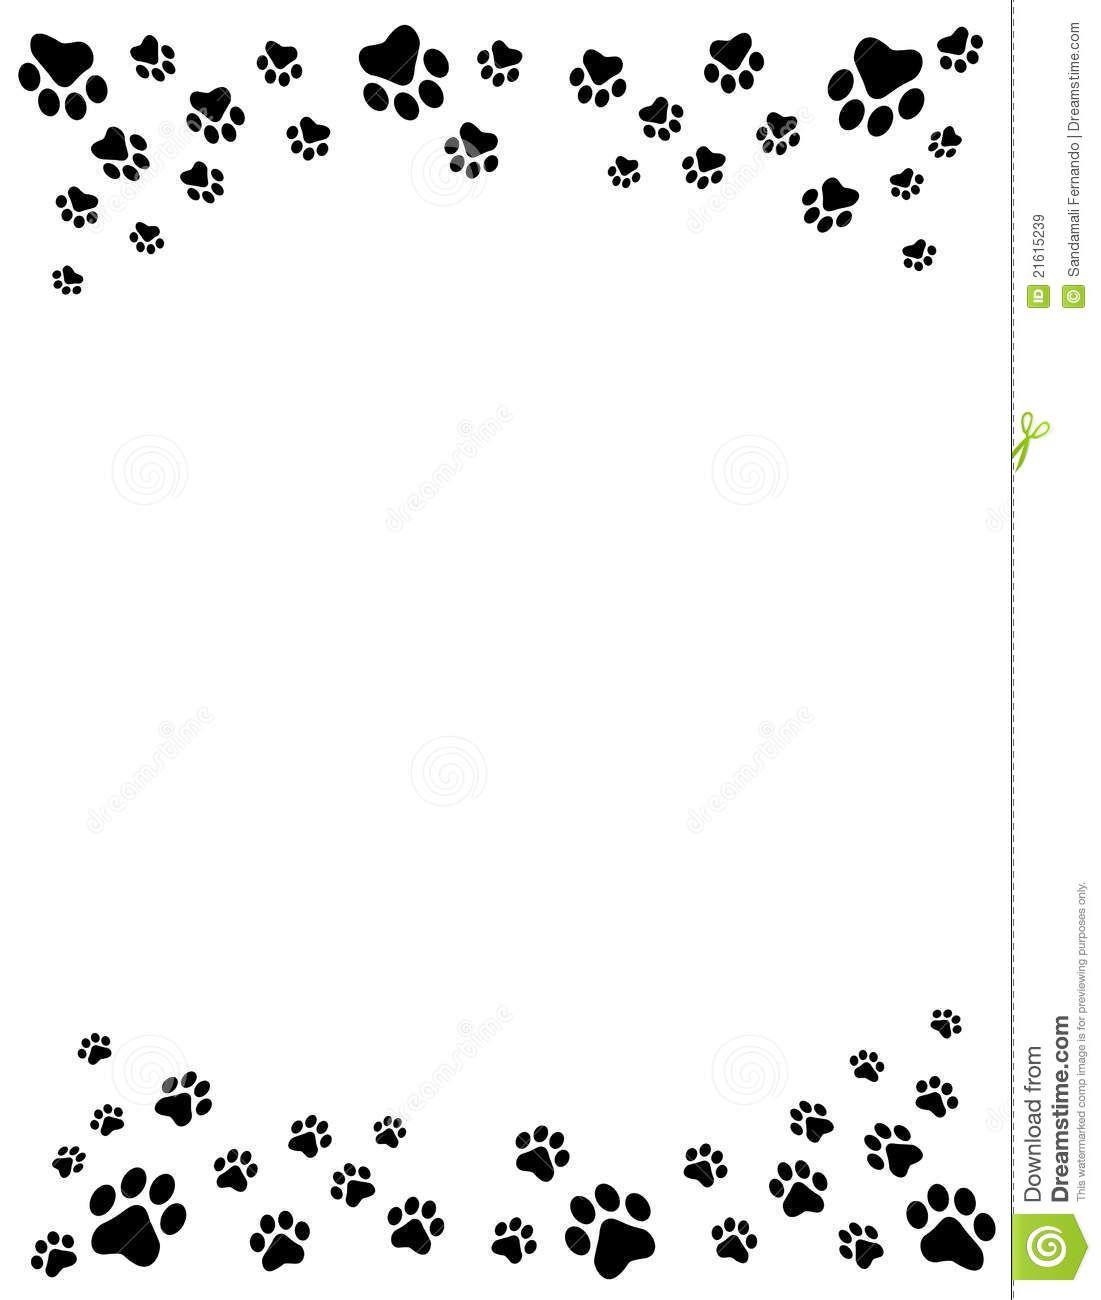 Cats borders